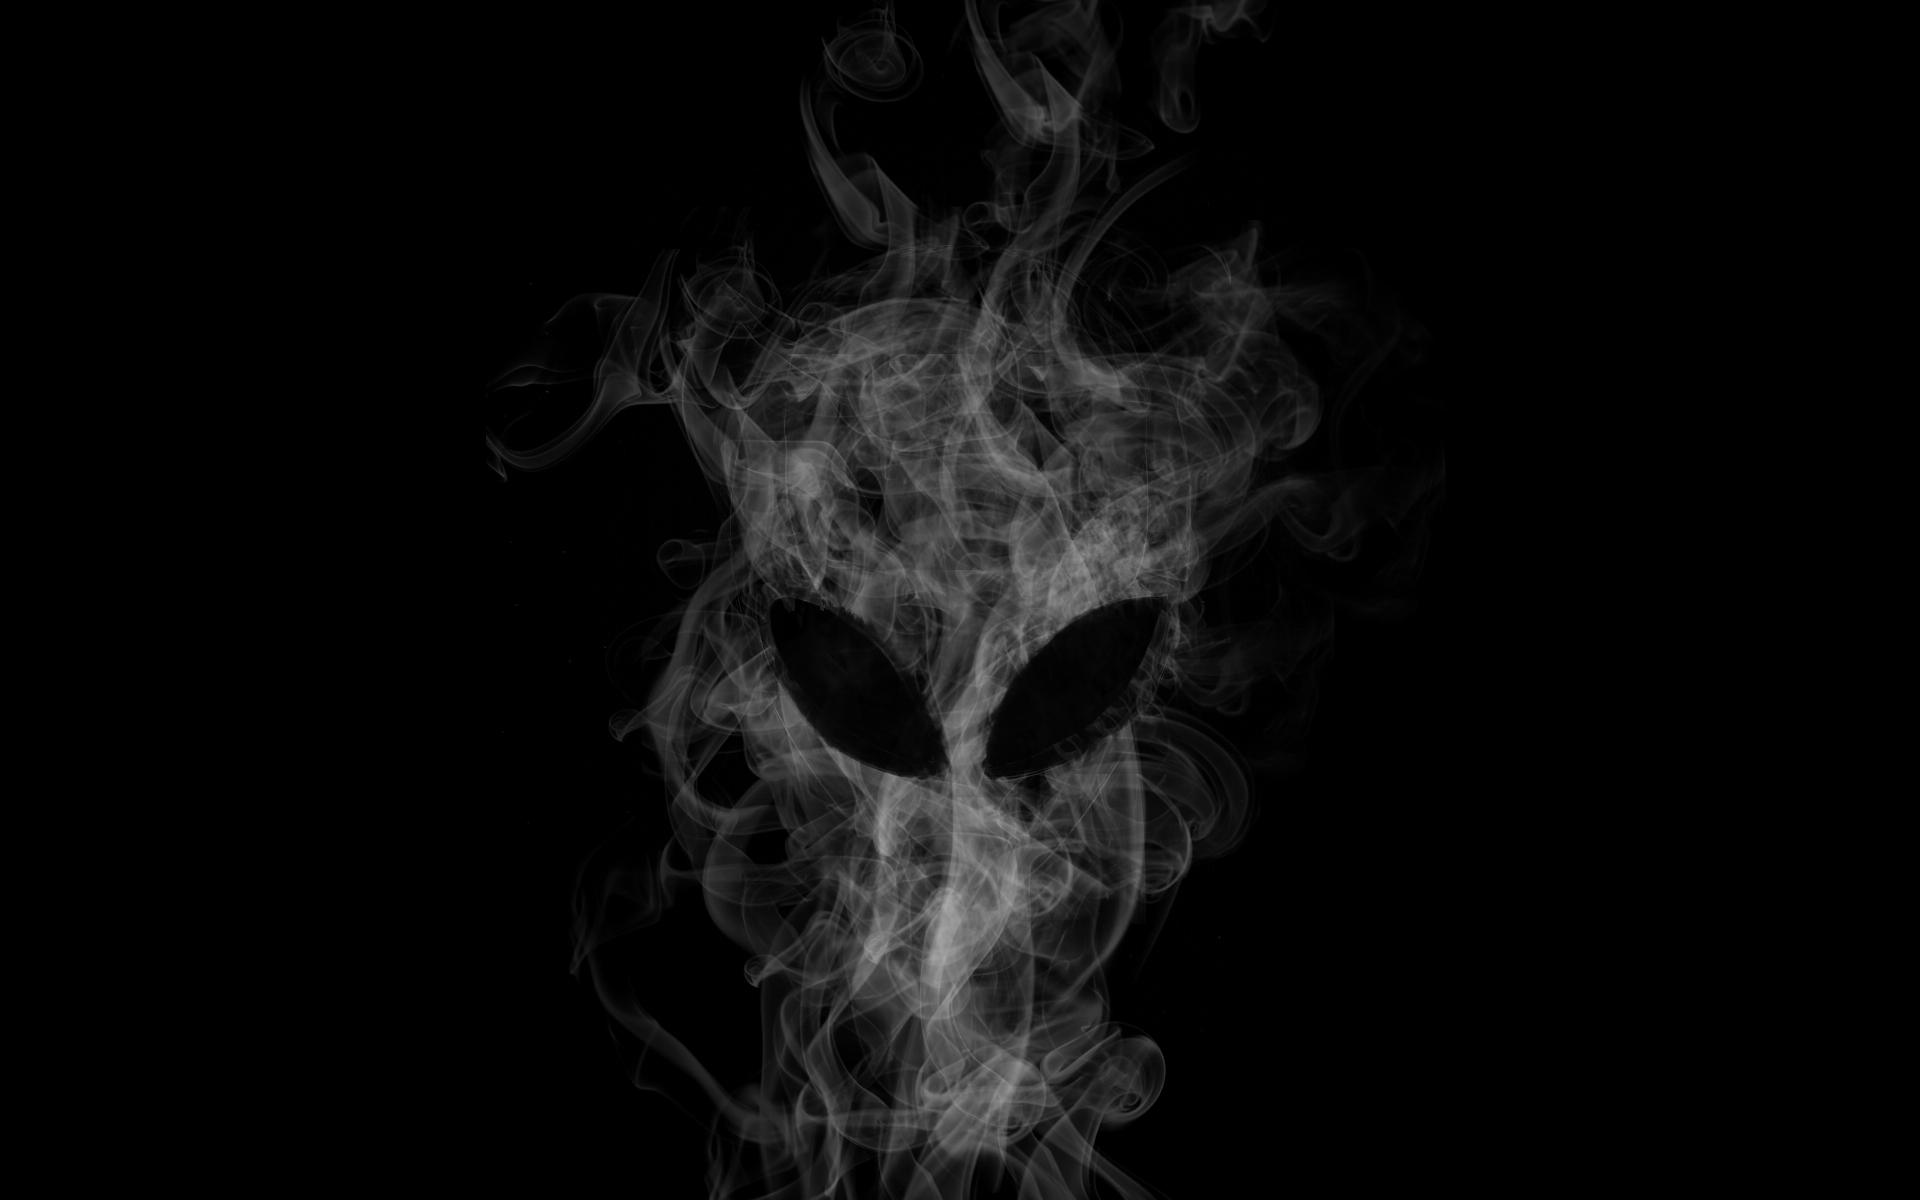 Smoke Computer Wallpapers Desktop Backgrounds 1920x1200 ID260444 1920x1200